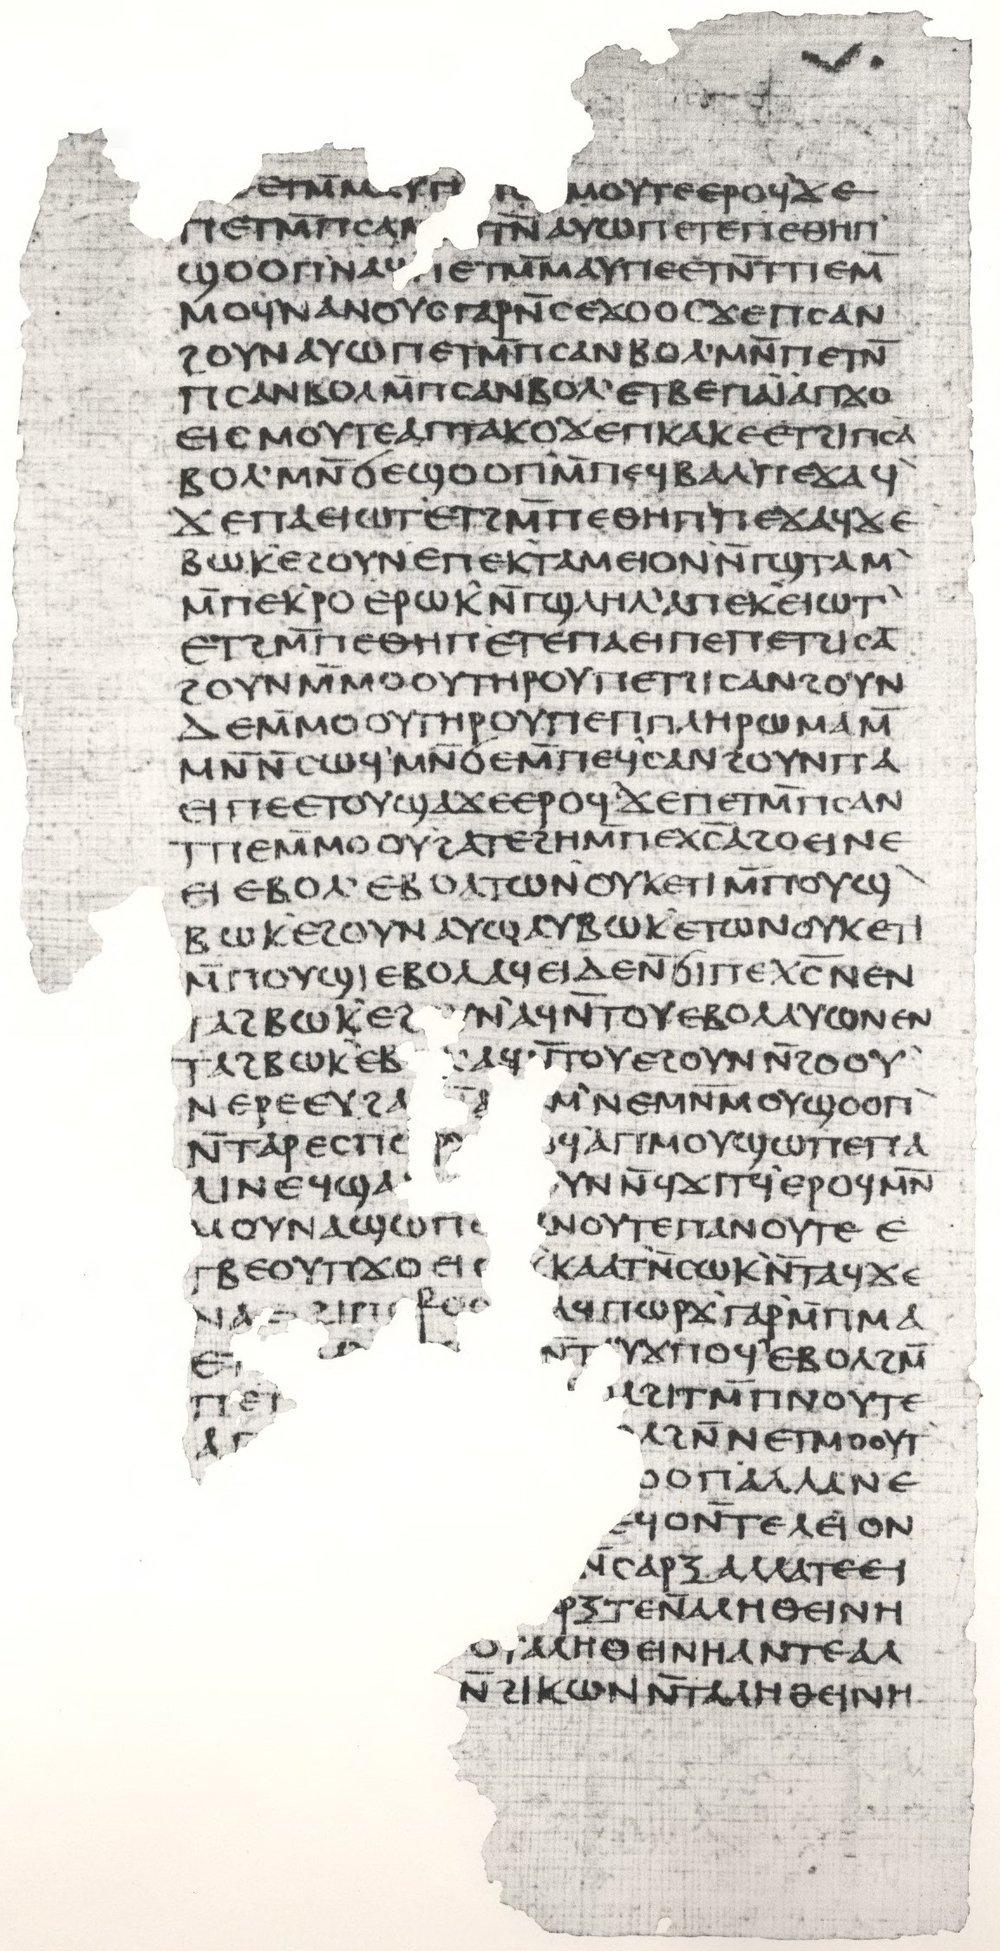 Gospel_of_Philip_facsimile_Page_68.jpg